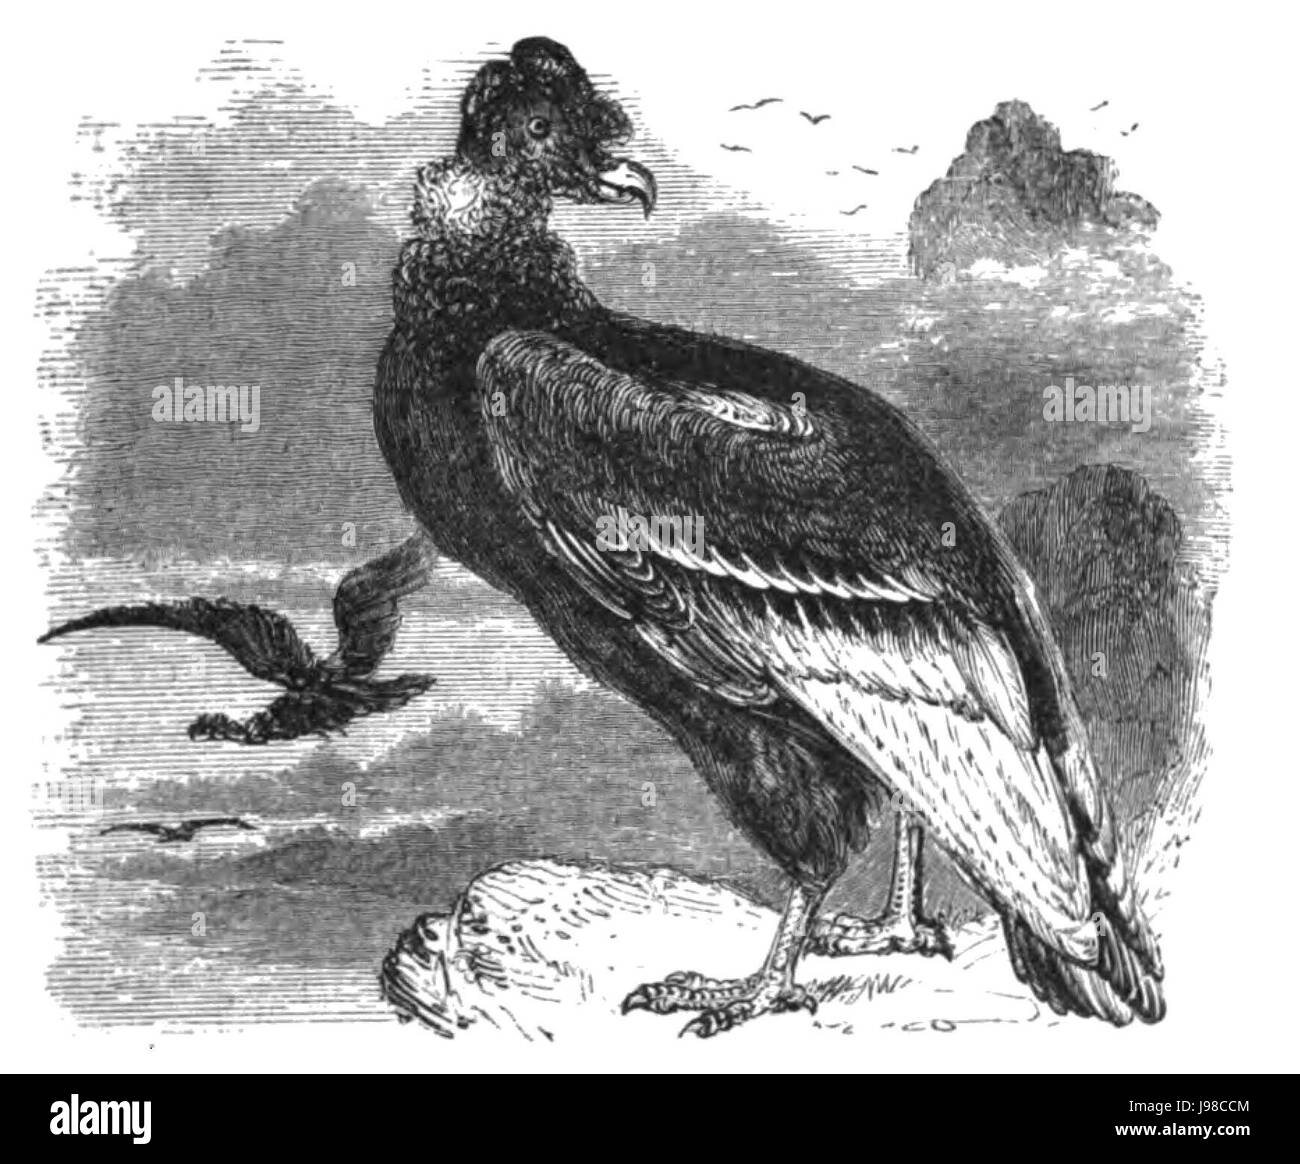 Natural History, Birds   Condor - Stock Image